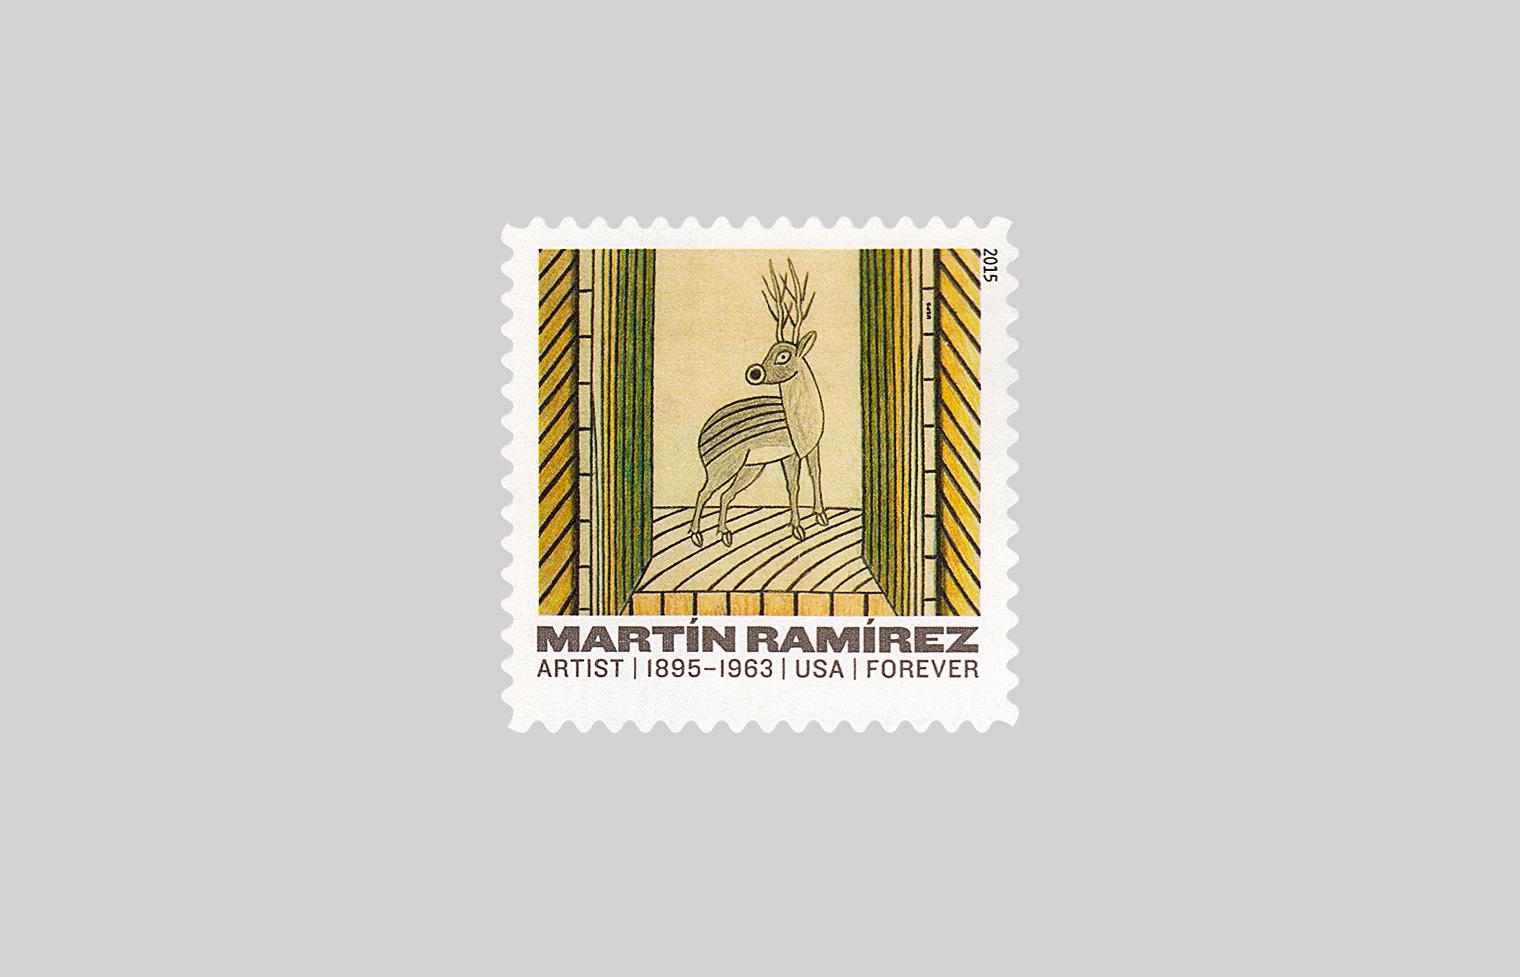 Martin Ramirez Stamp